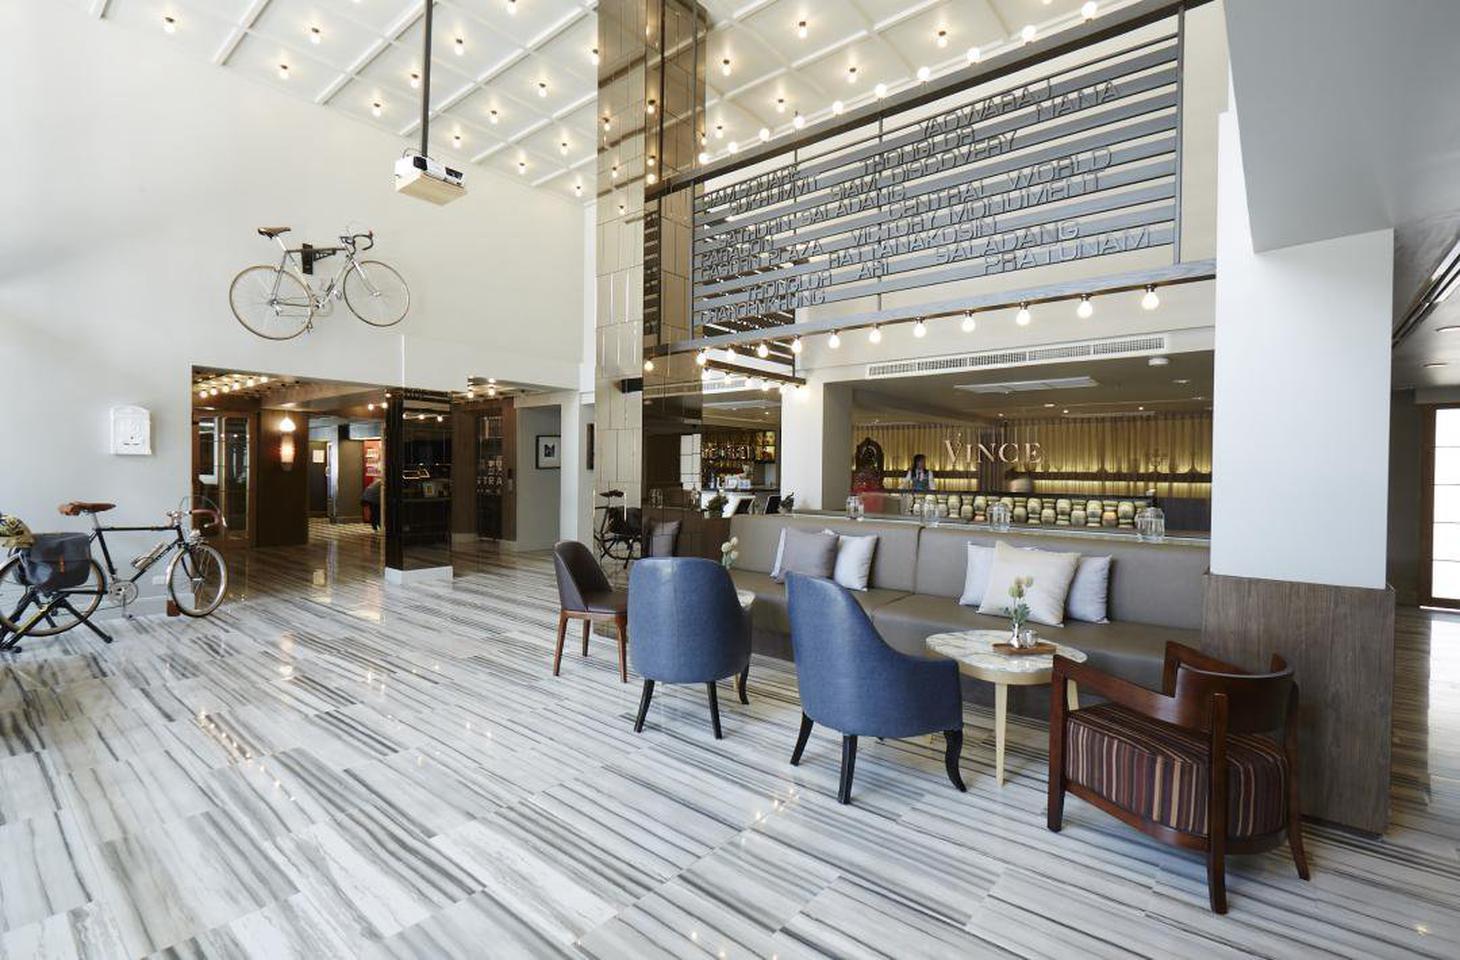 Vince Hotel Pratunarm รูปที่ 3